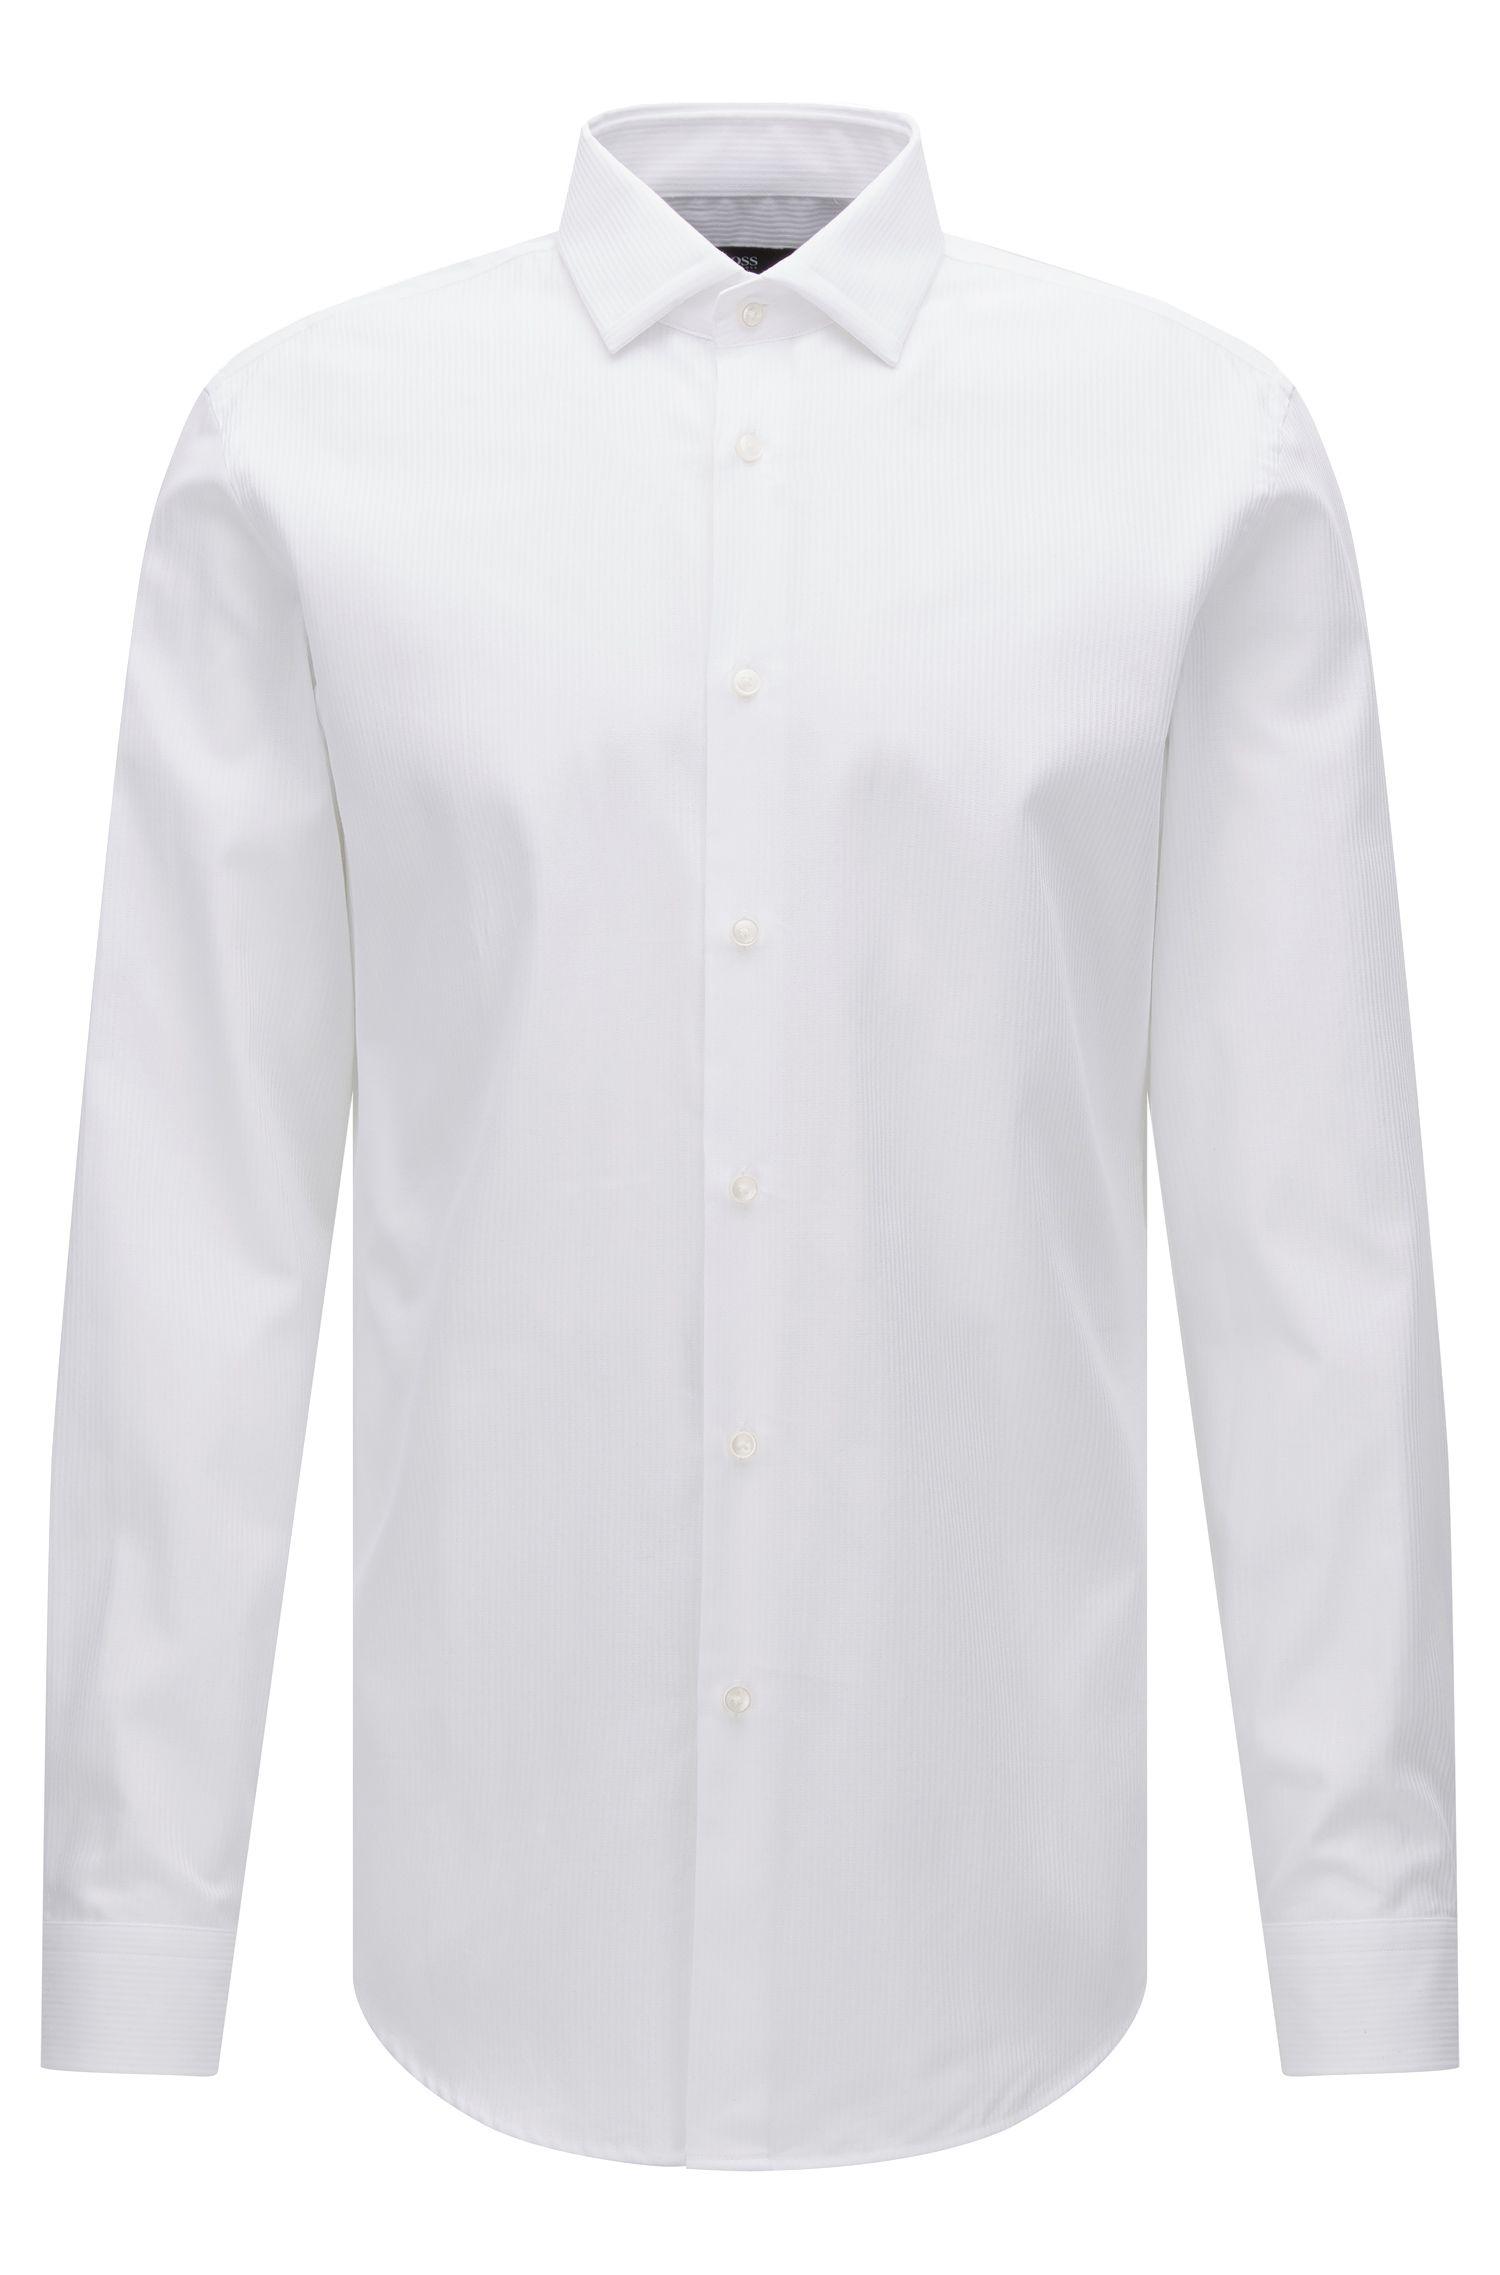 Tonal Stripe Cotton Dress Shirt, Slim Fit | Iseo